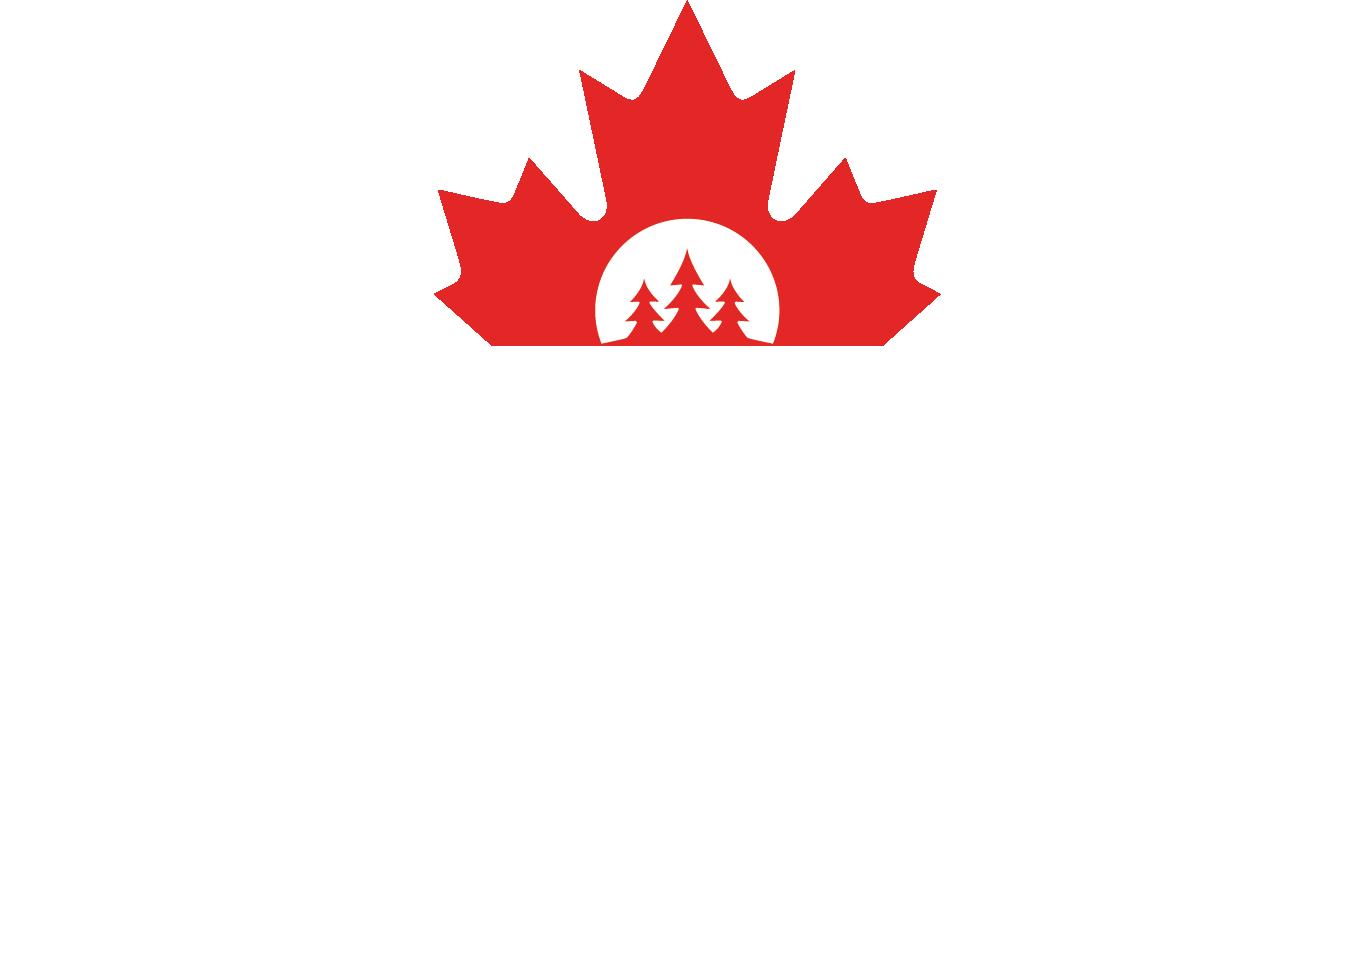 DestinationNorthernOntario_White+Red